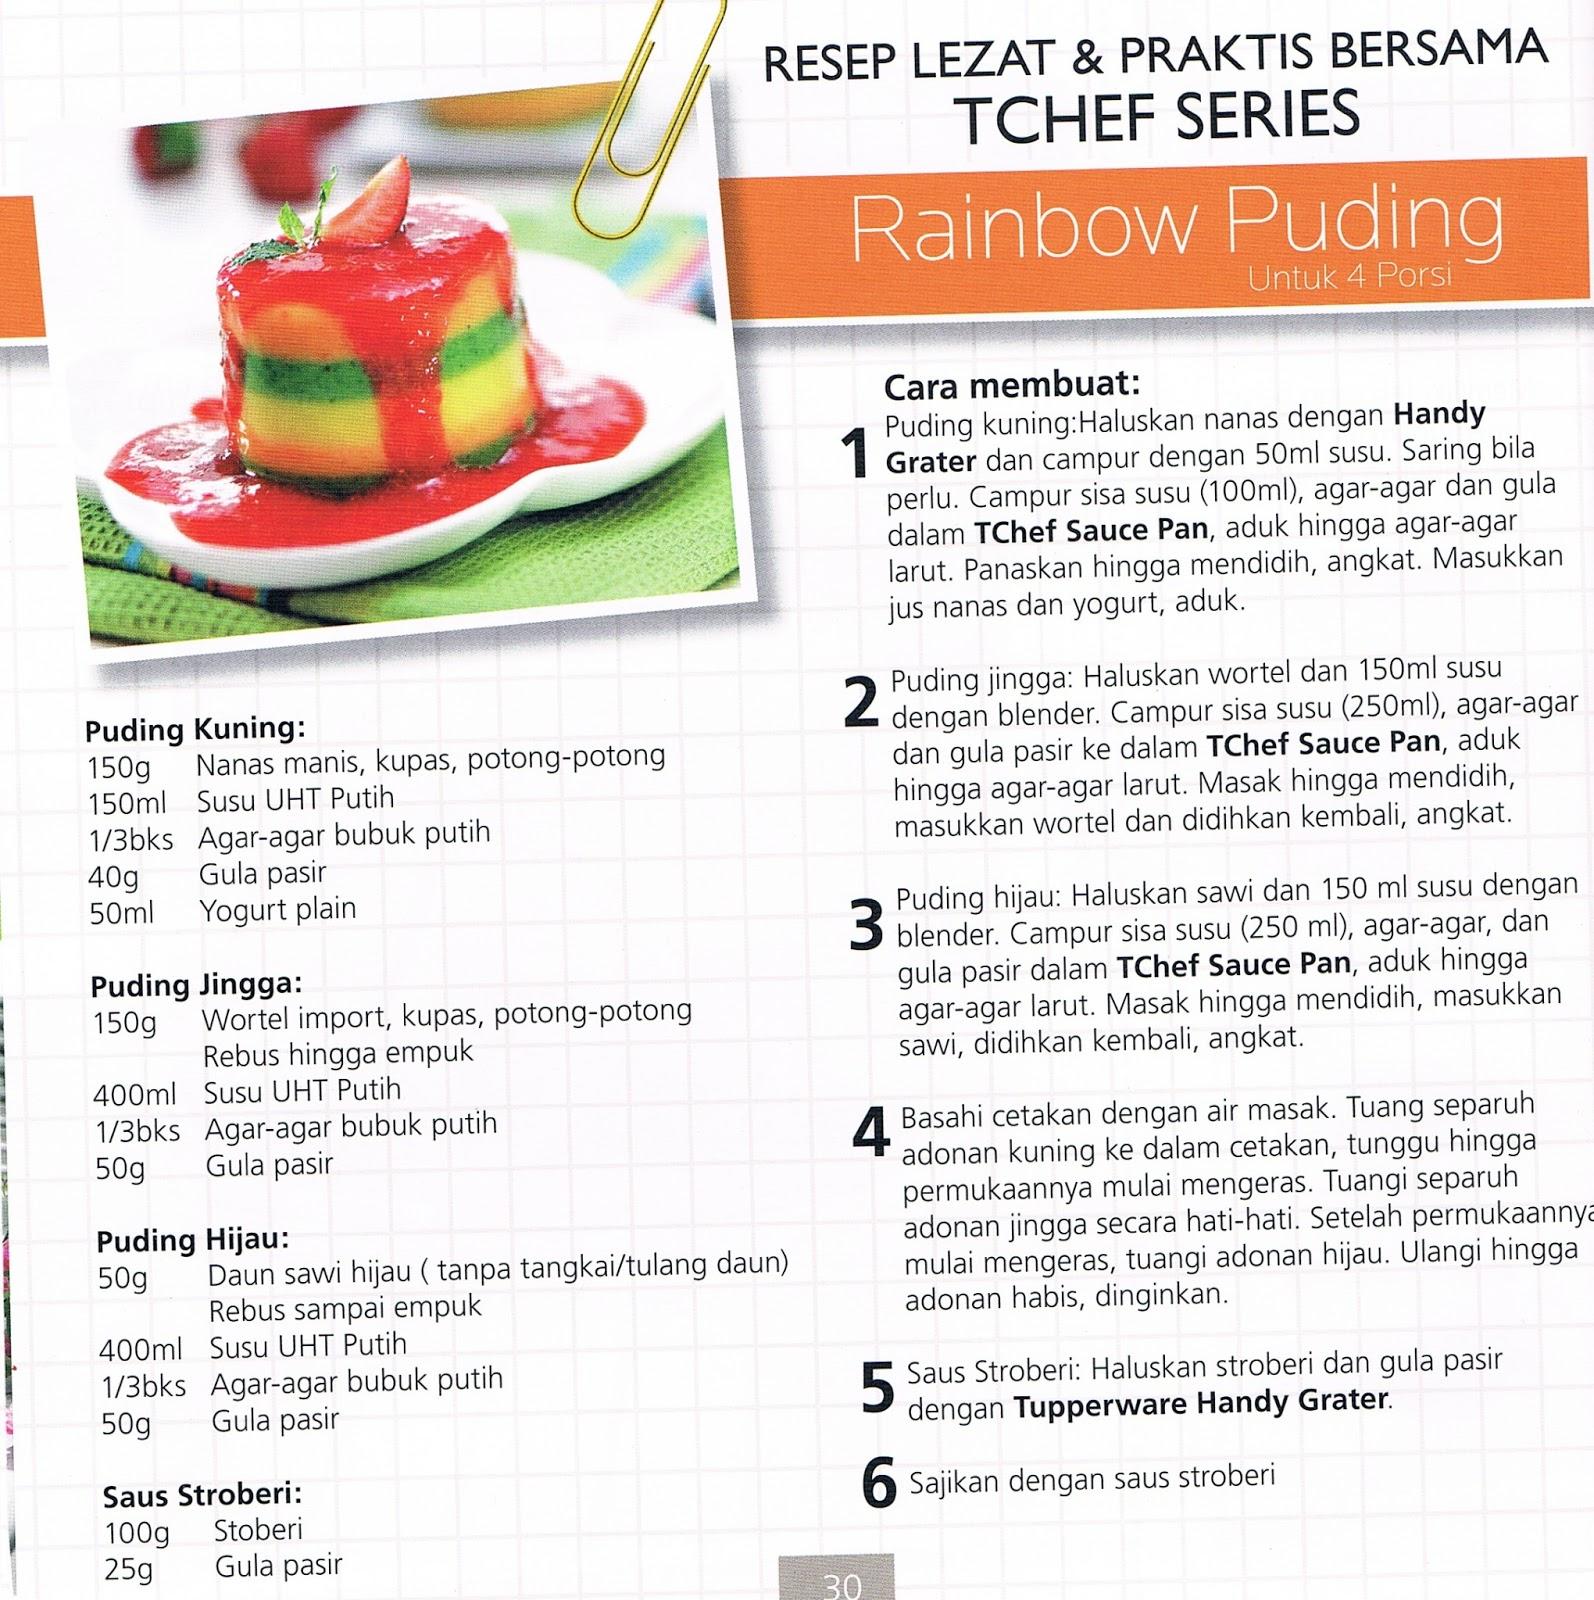 Harga Karet 30 Maret 2013 Icefilmsinfo Globolister Tupperware Surabaya Diskon Katalog Tupperware Promo Maret 2013